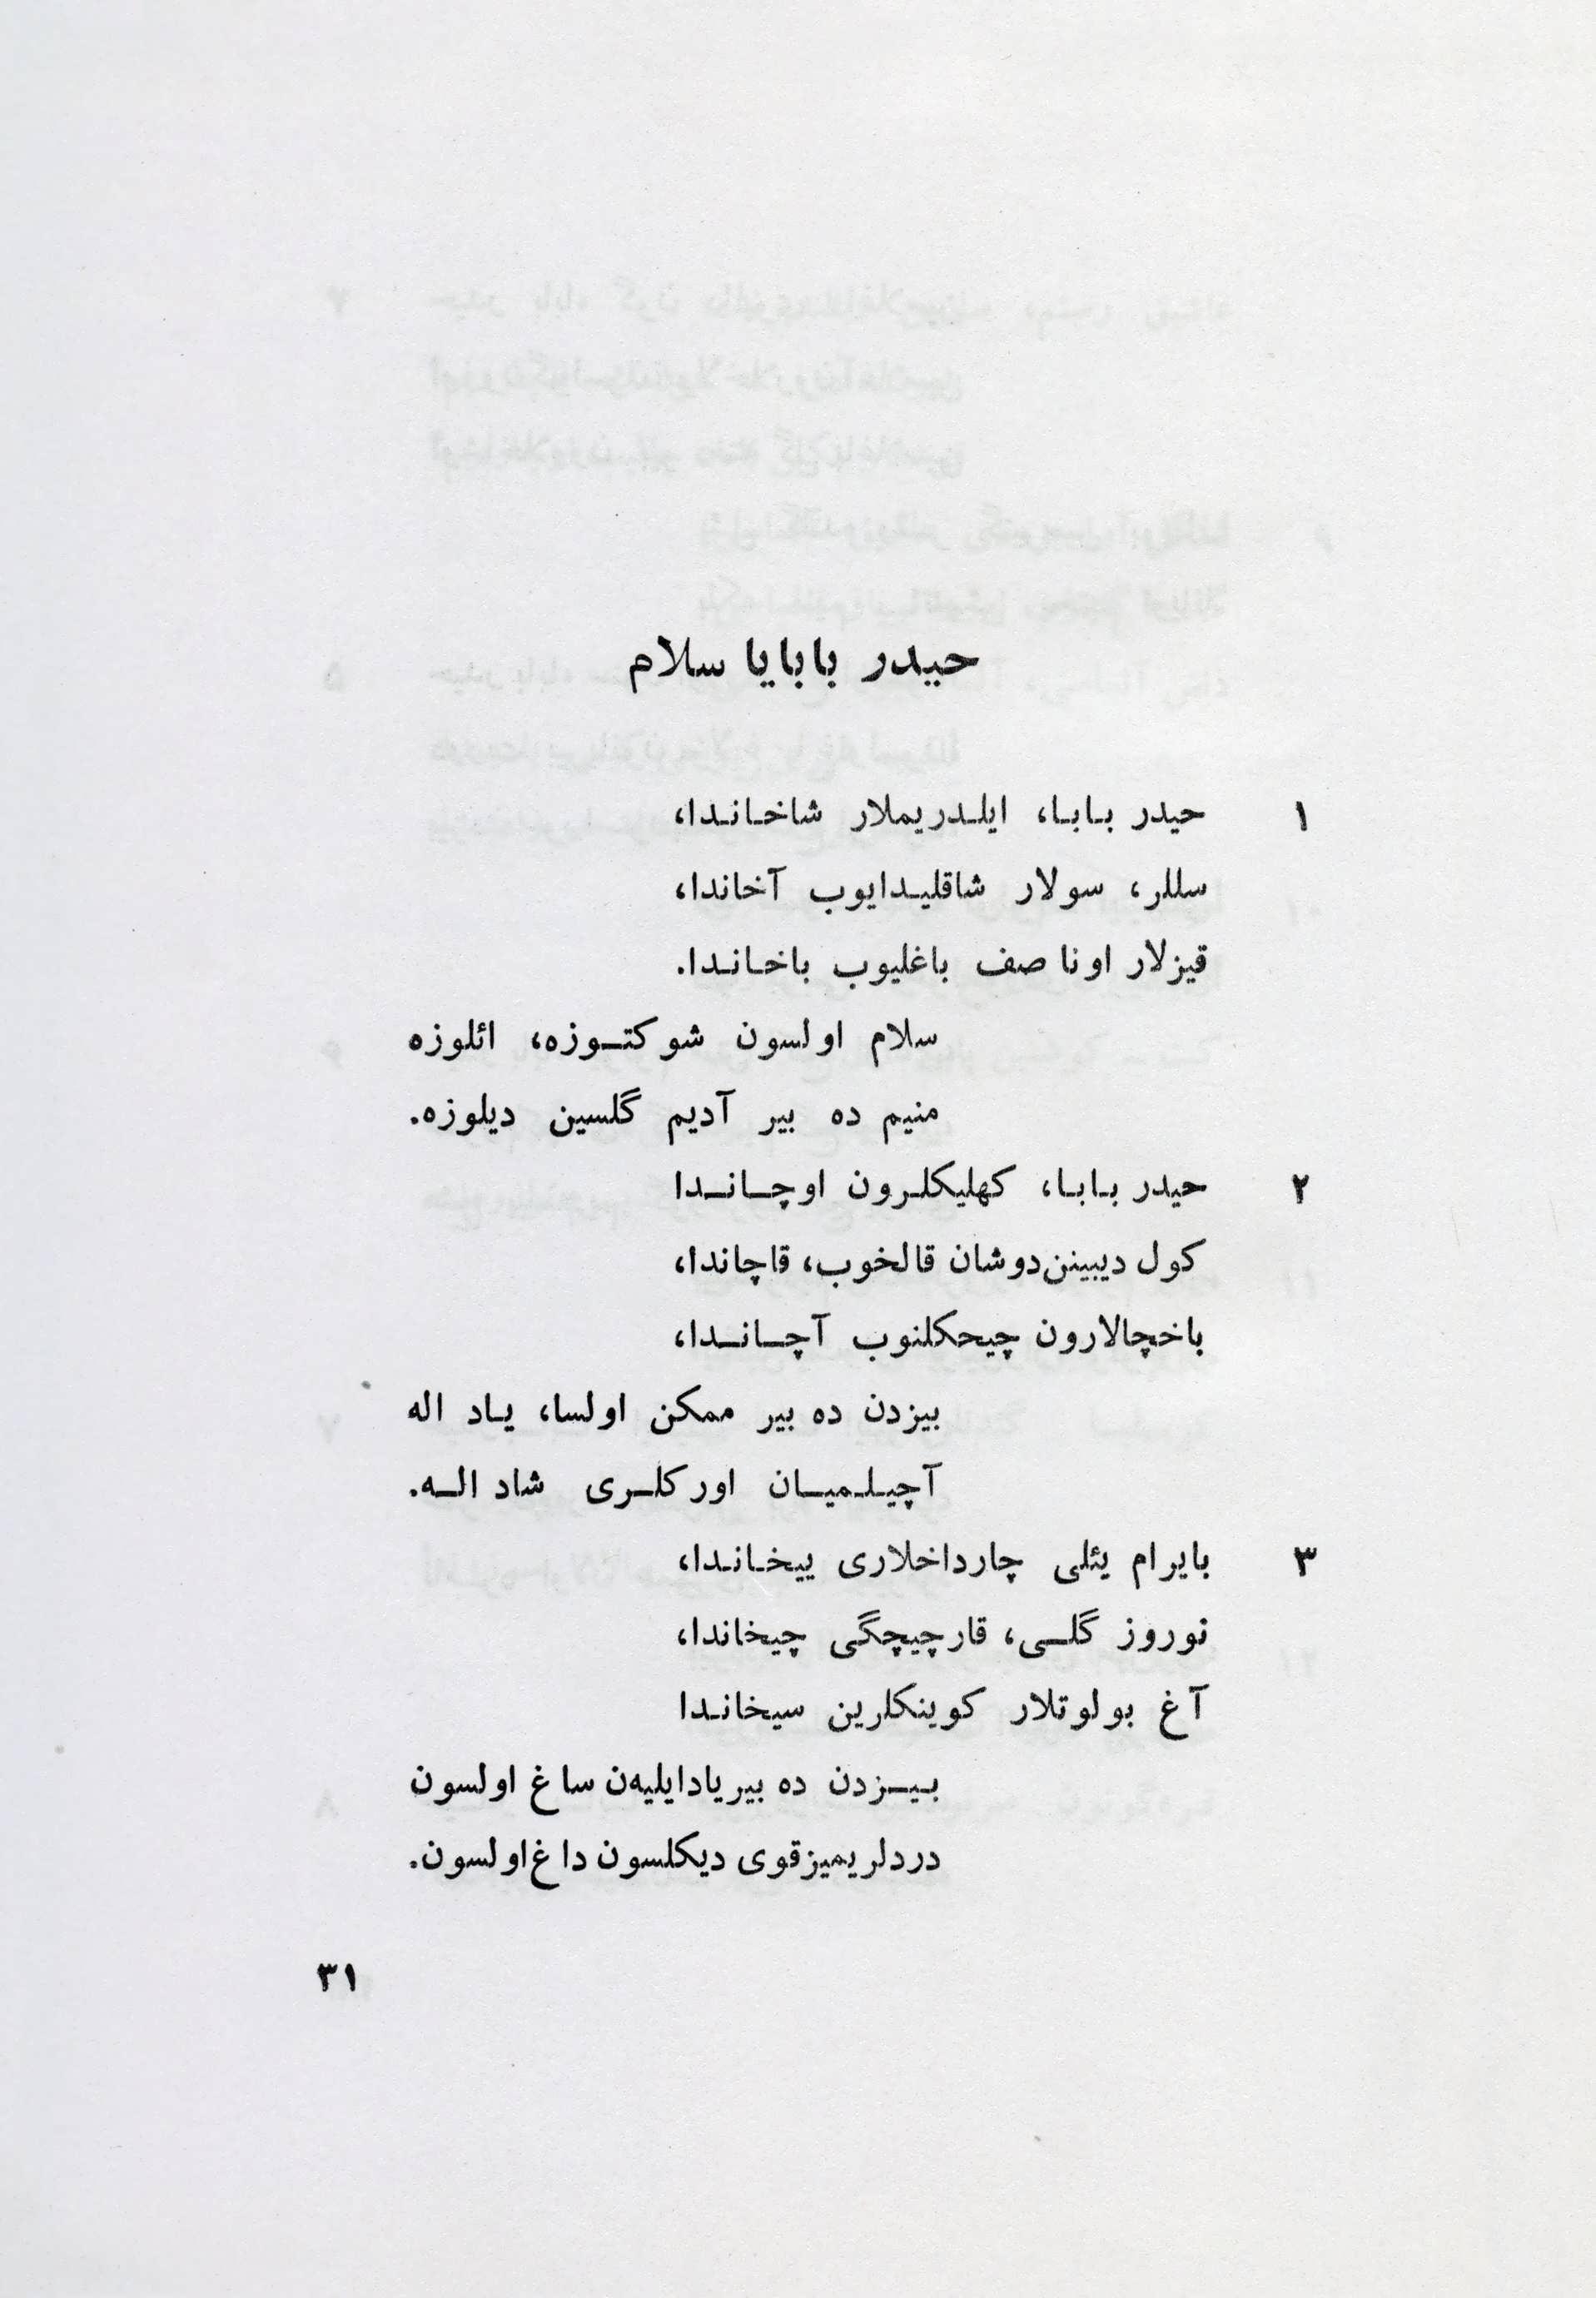 کلیات اشعار ترکی شهریار به انضمام حیدربابایا سلام